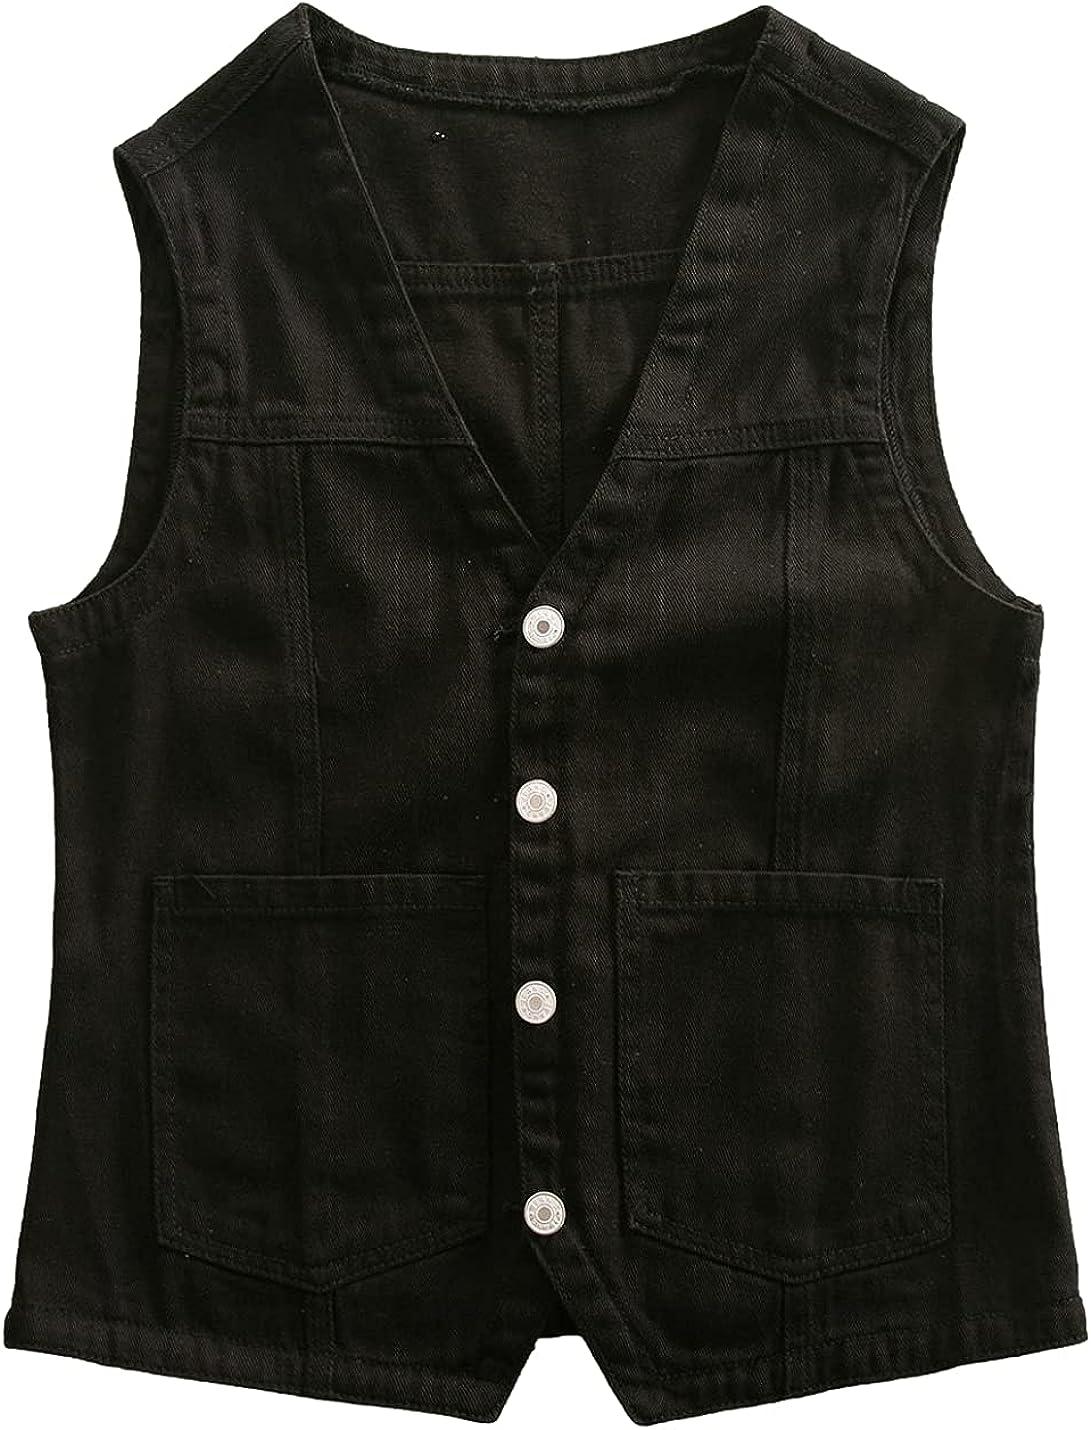 Bnigung Women's Casual Sleeveless Denim Vest V Neck Button Down Loose Jean Waistcoat Jacket